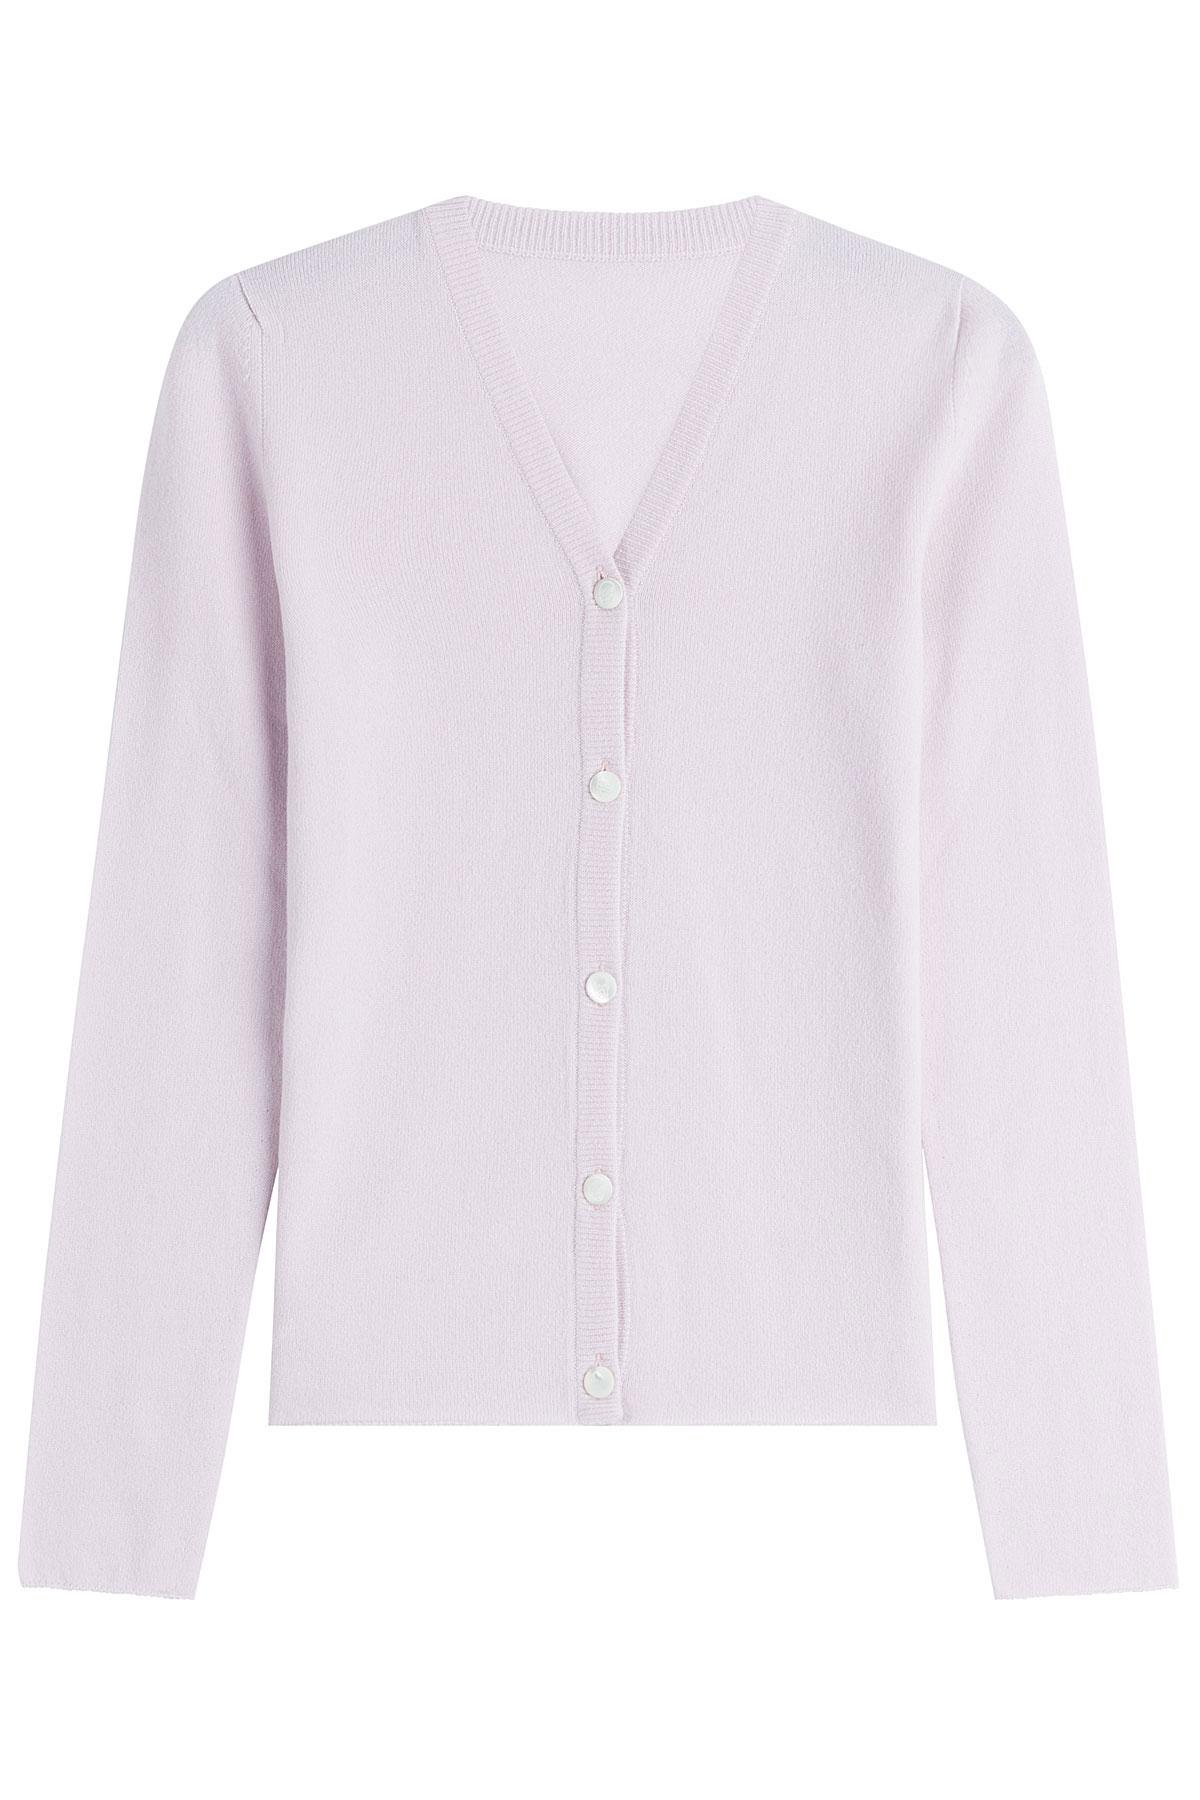 Lucien pellat finet Cashmere Cardigan - Rose in Pink | Lyst